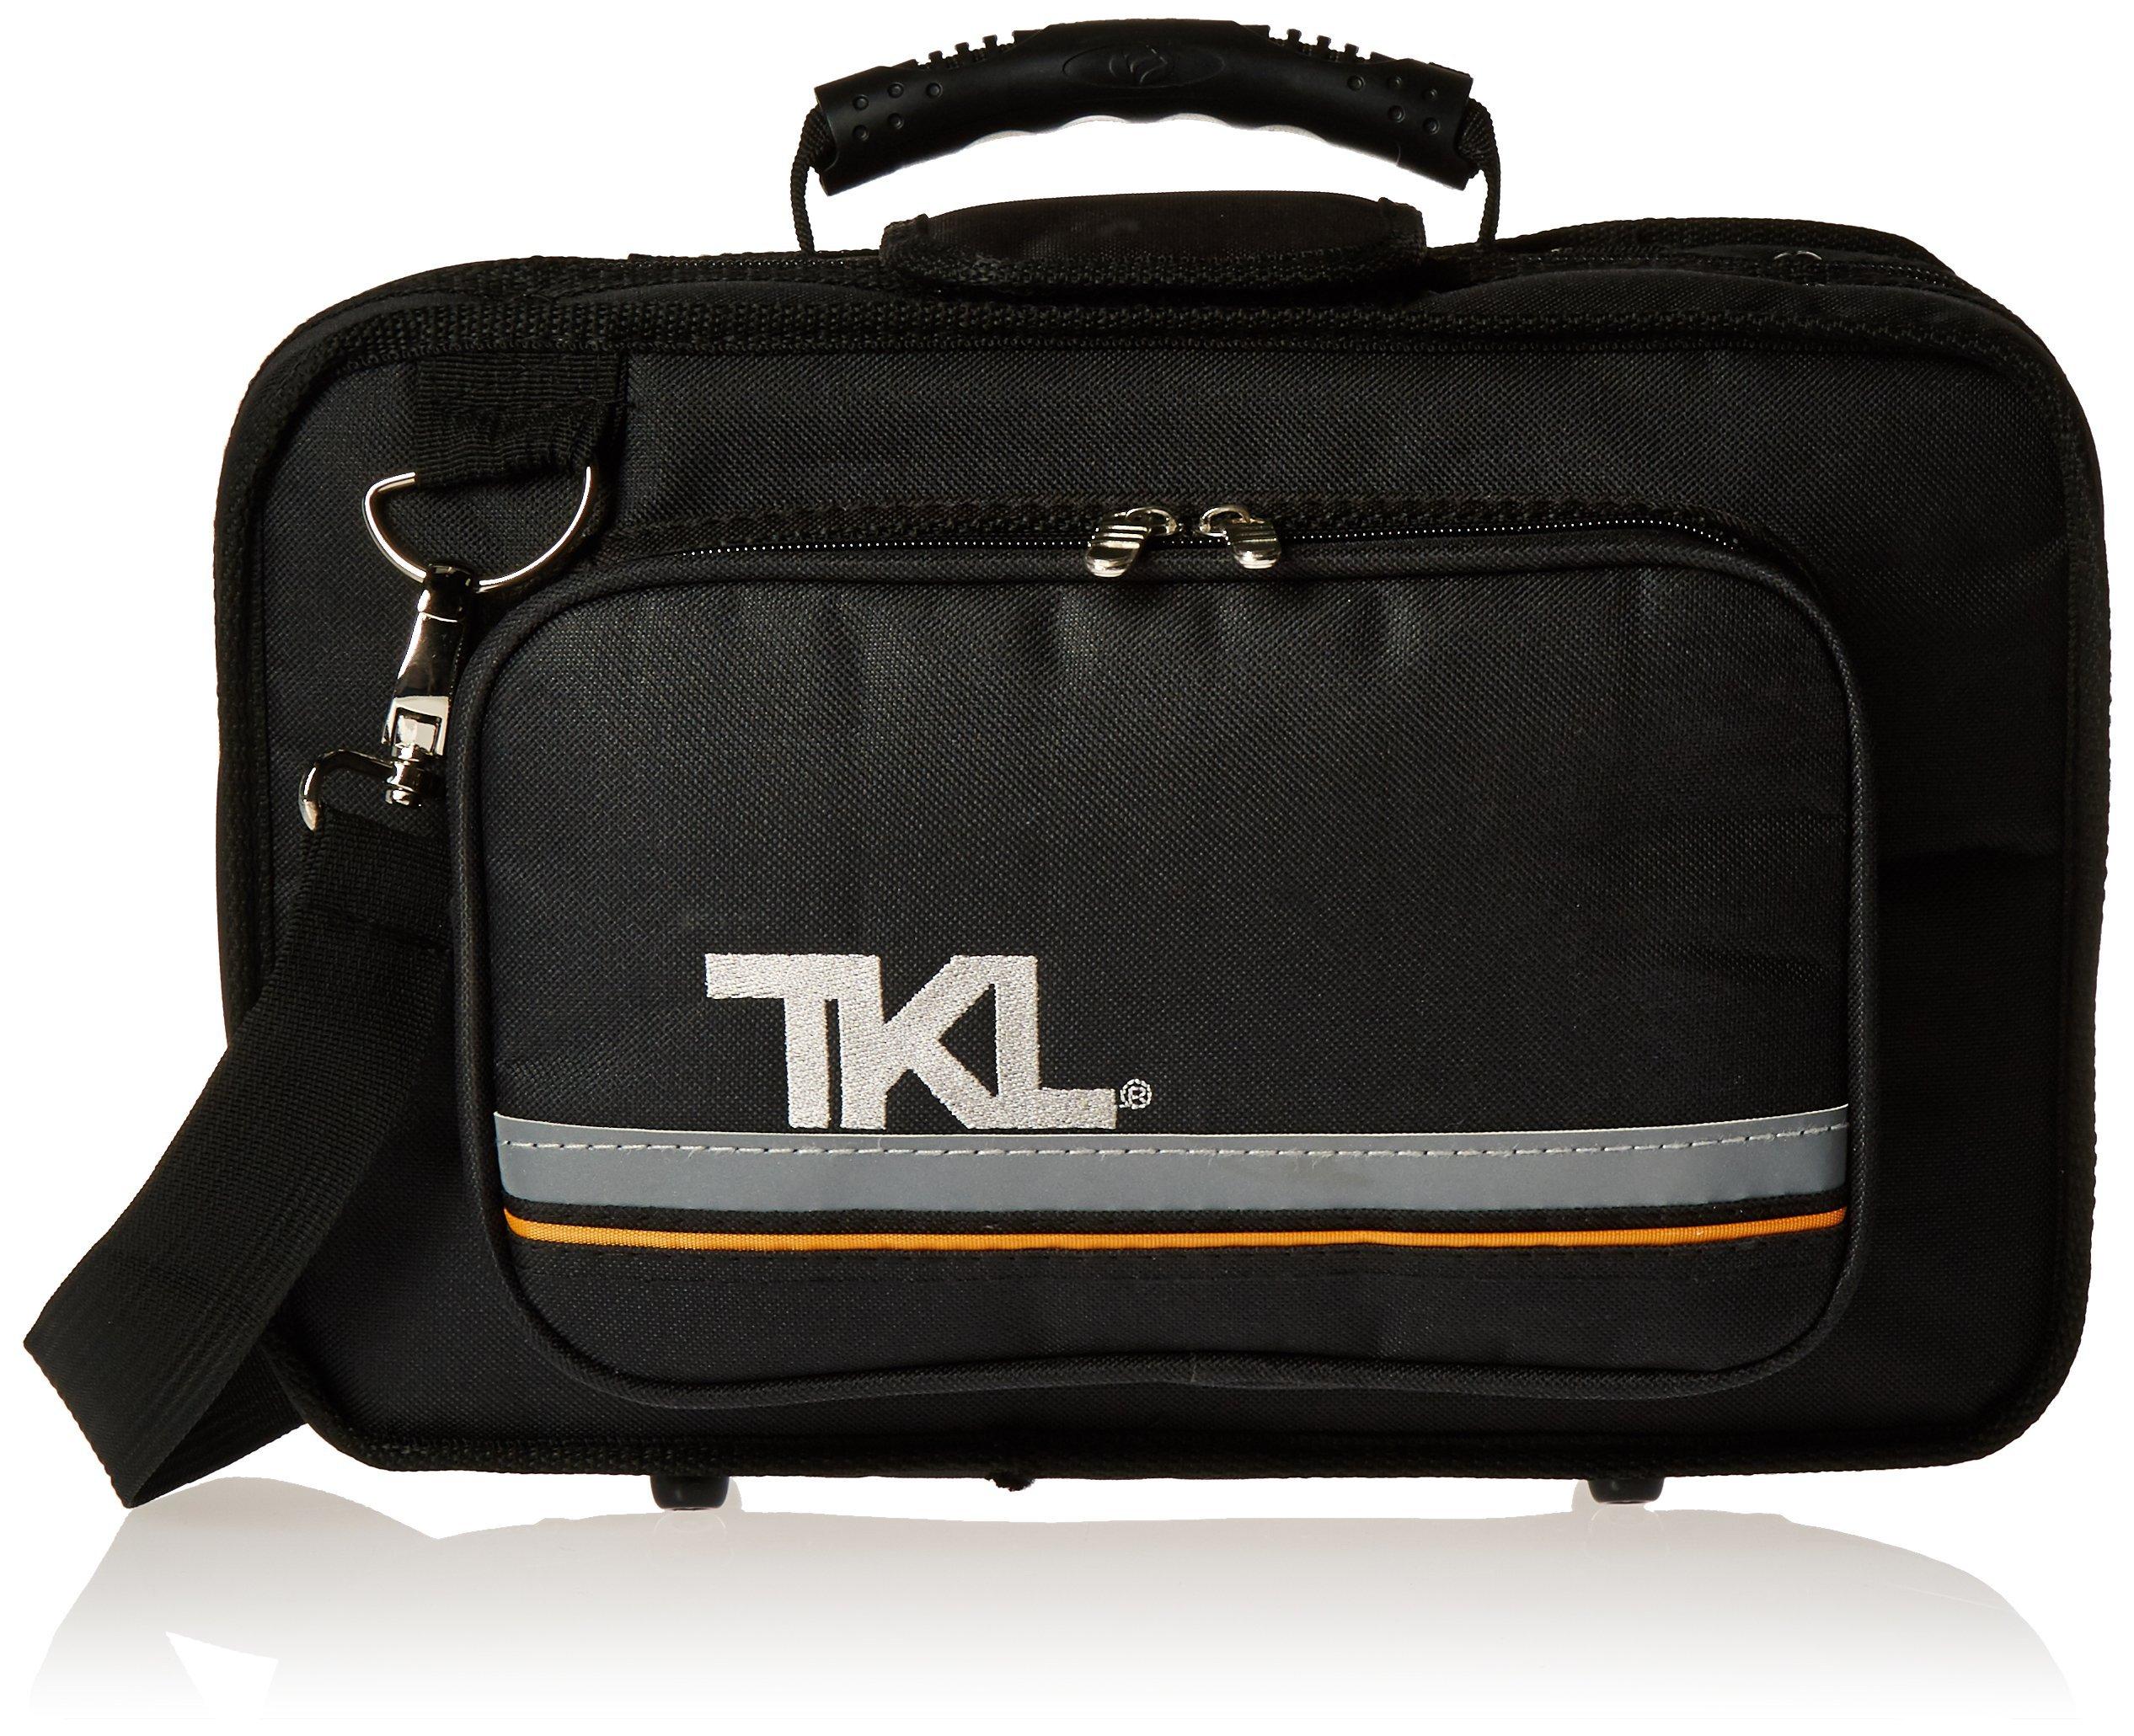 TKL 6191 Zero Gravity Clarinet Case